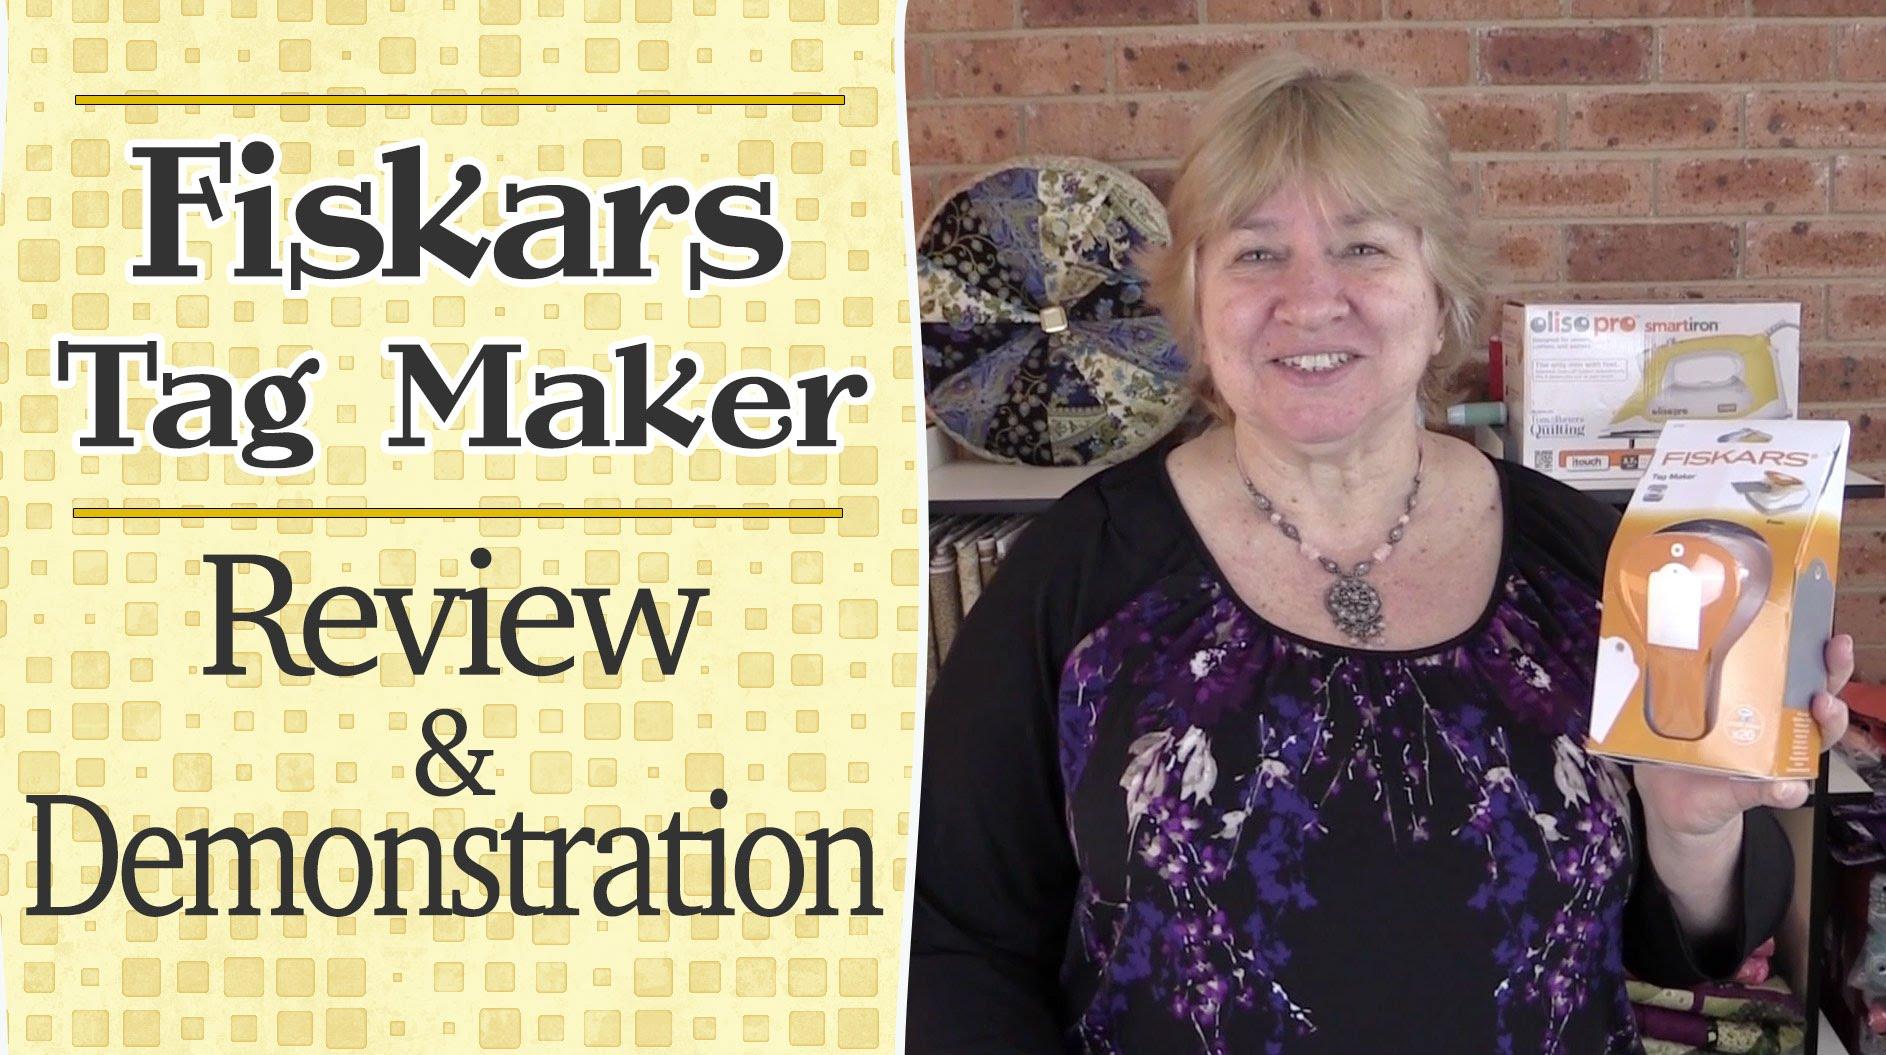 Crafty Tools n Tips: Fiskars Tag Maker – Review & Demonstration